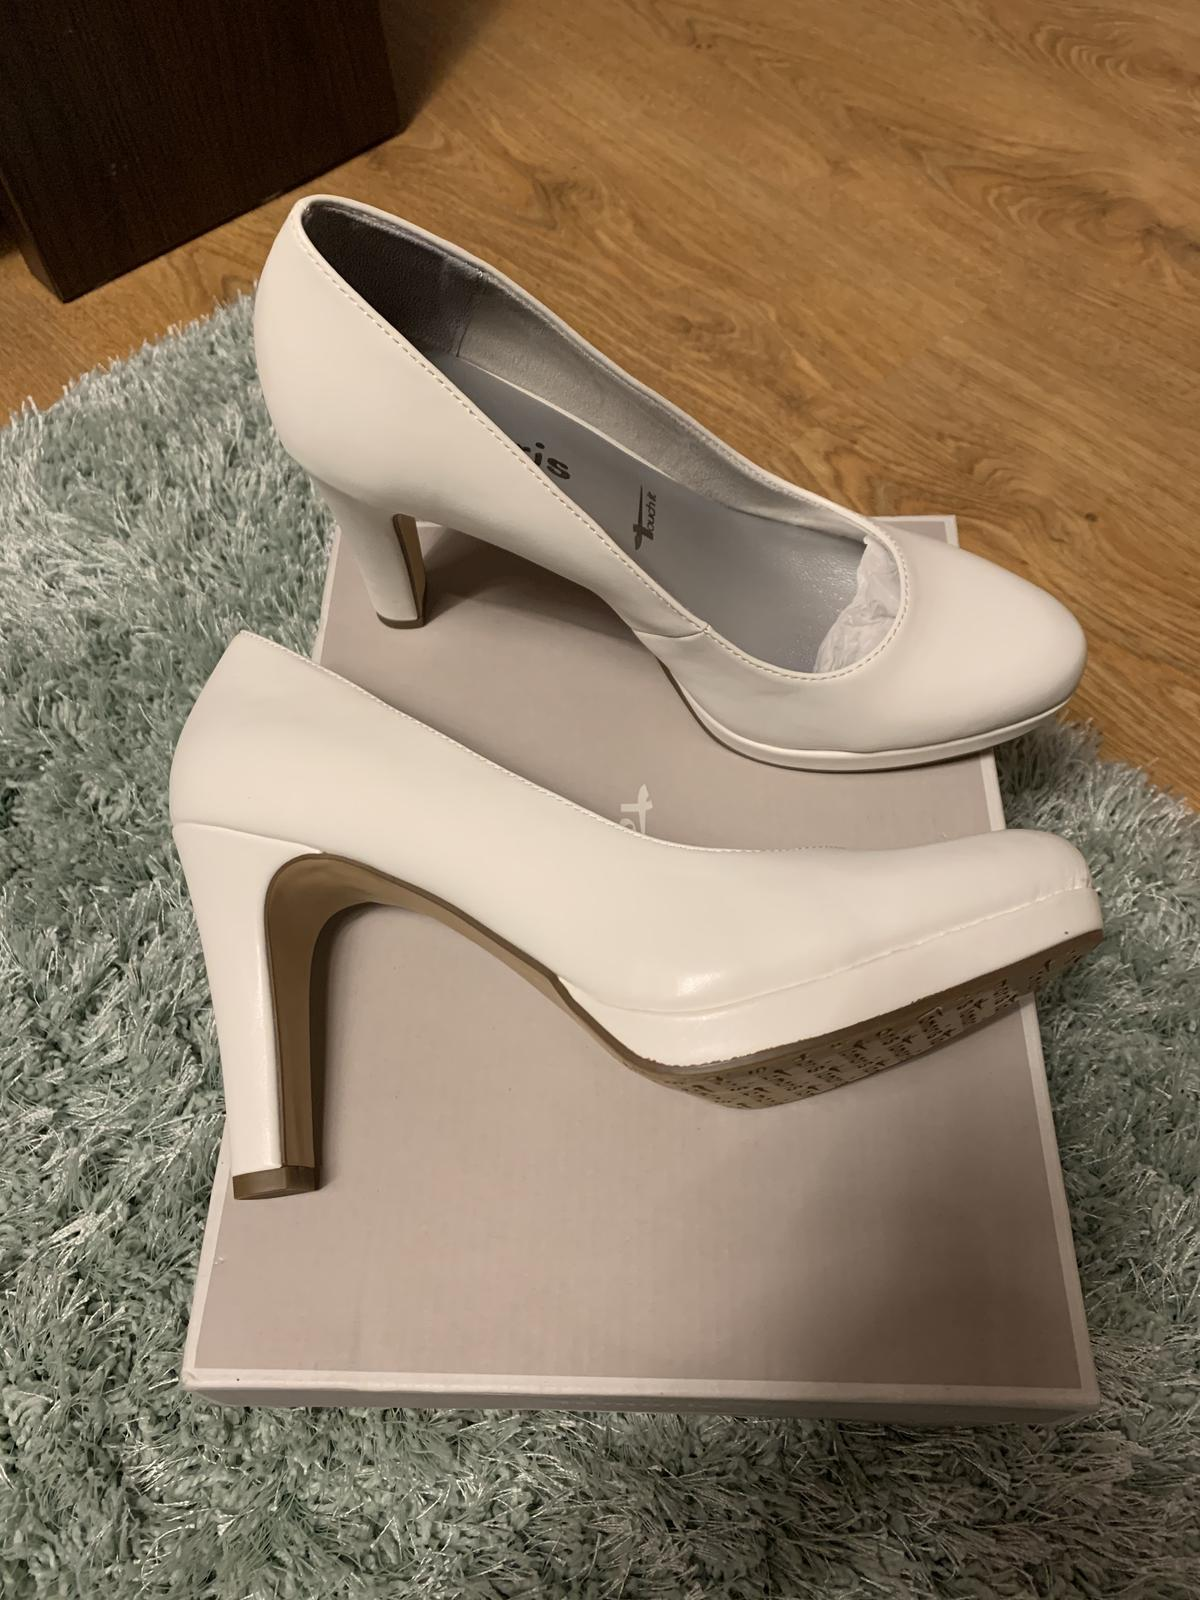 Svadobné topánky Tamaris - Obrázok č. 2